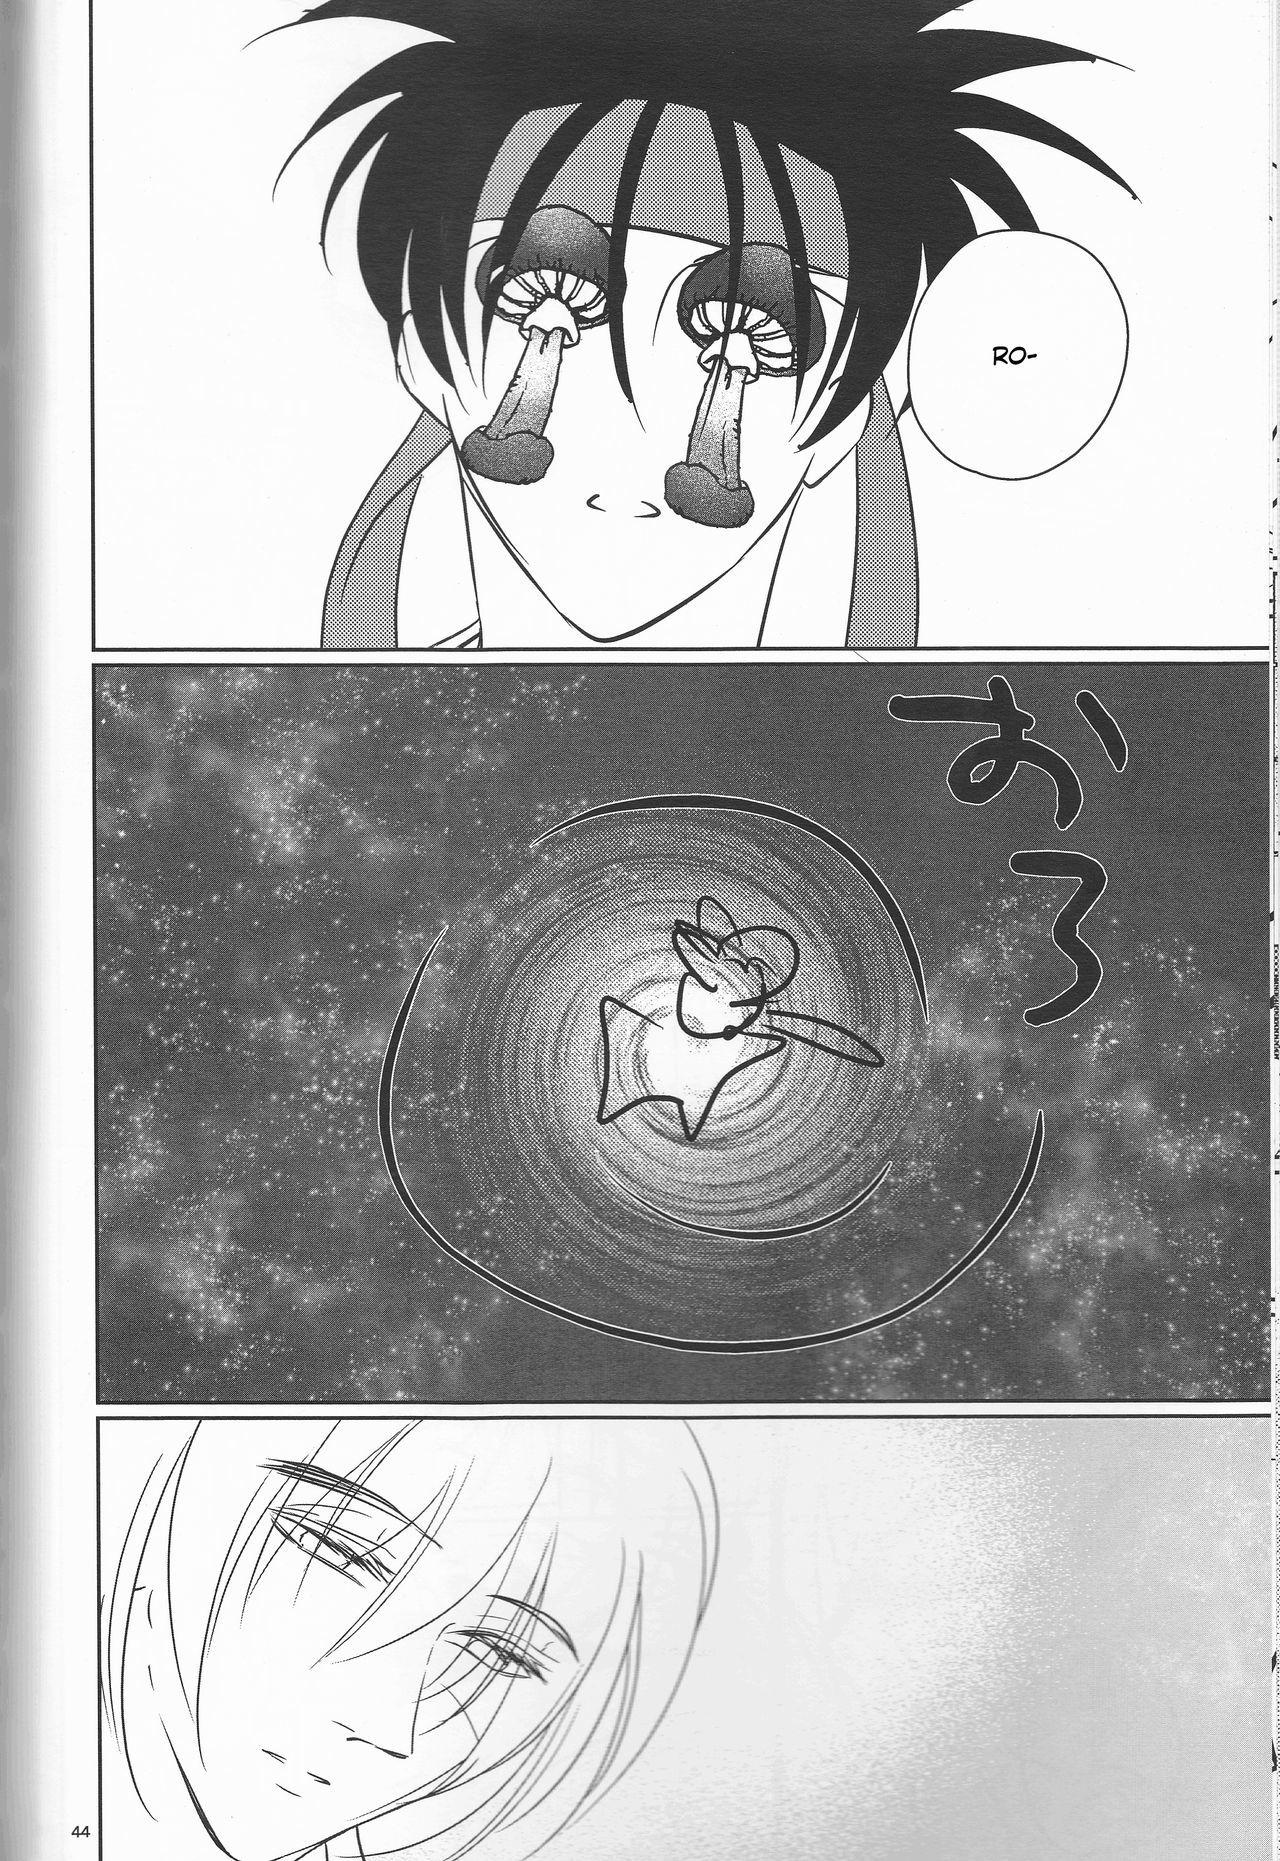 Hime ken ryoran page 44